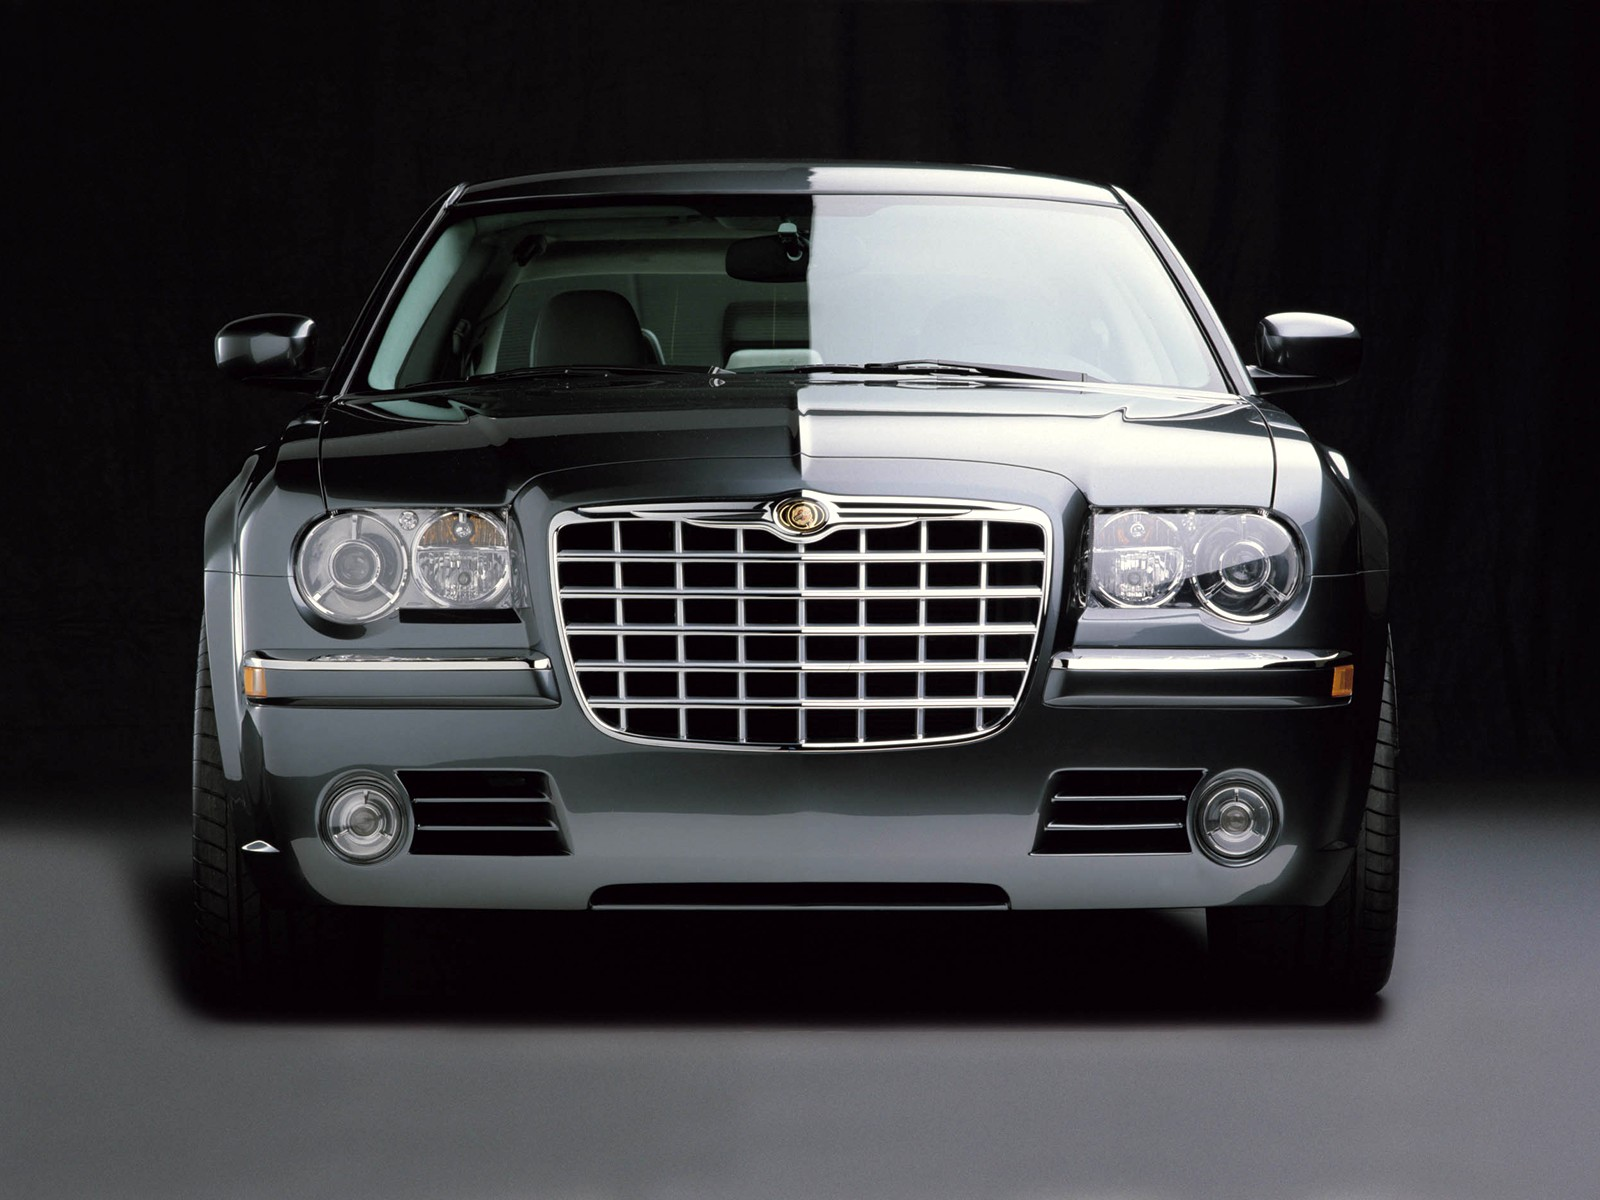 Chrysler 300 Car 2017